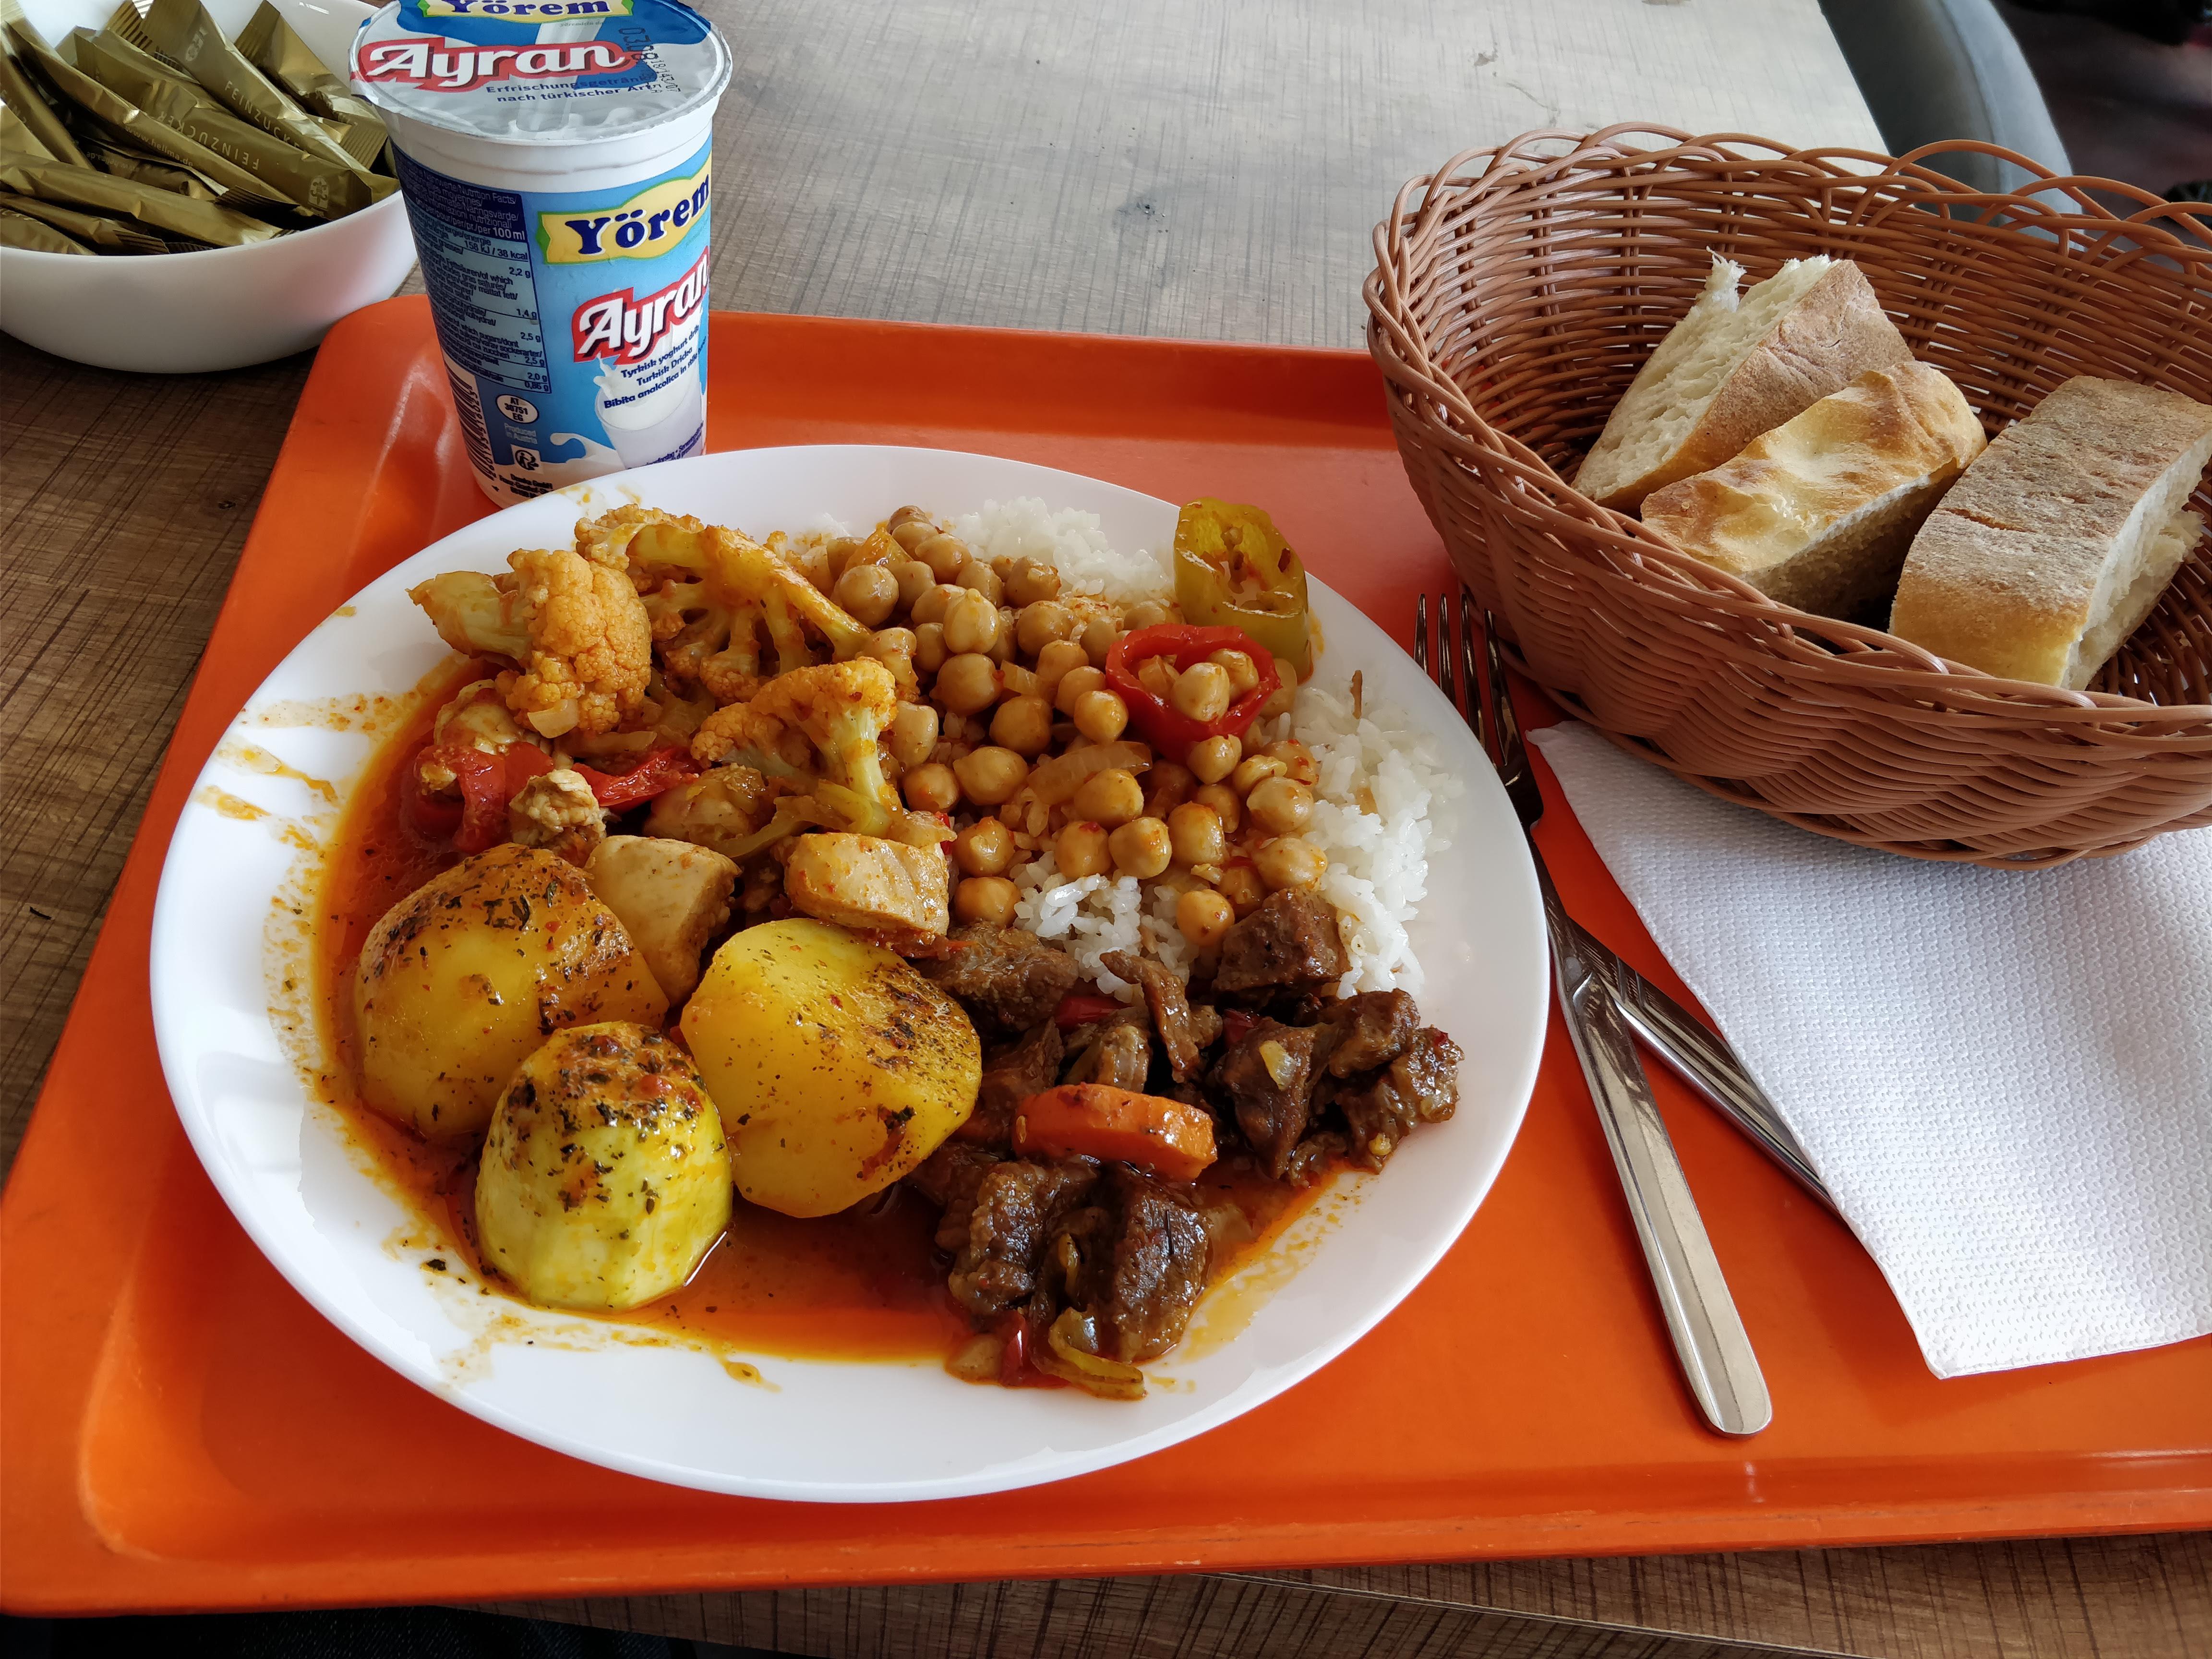 http://foodloader.net/nico_2018-06-18_tuerke-tagesbuffet.jpg